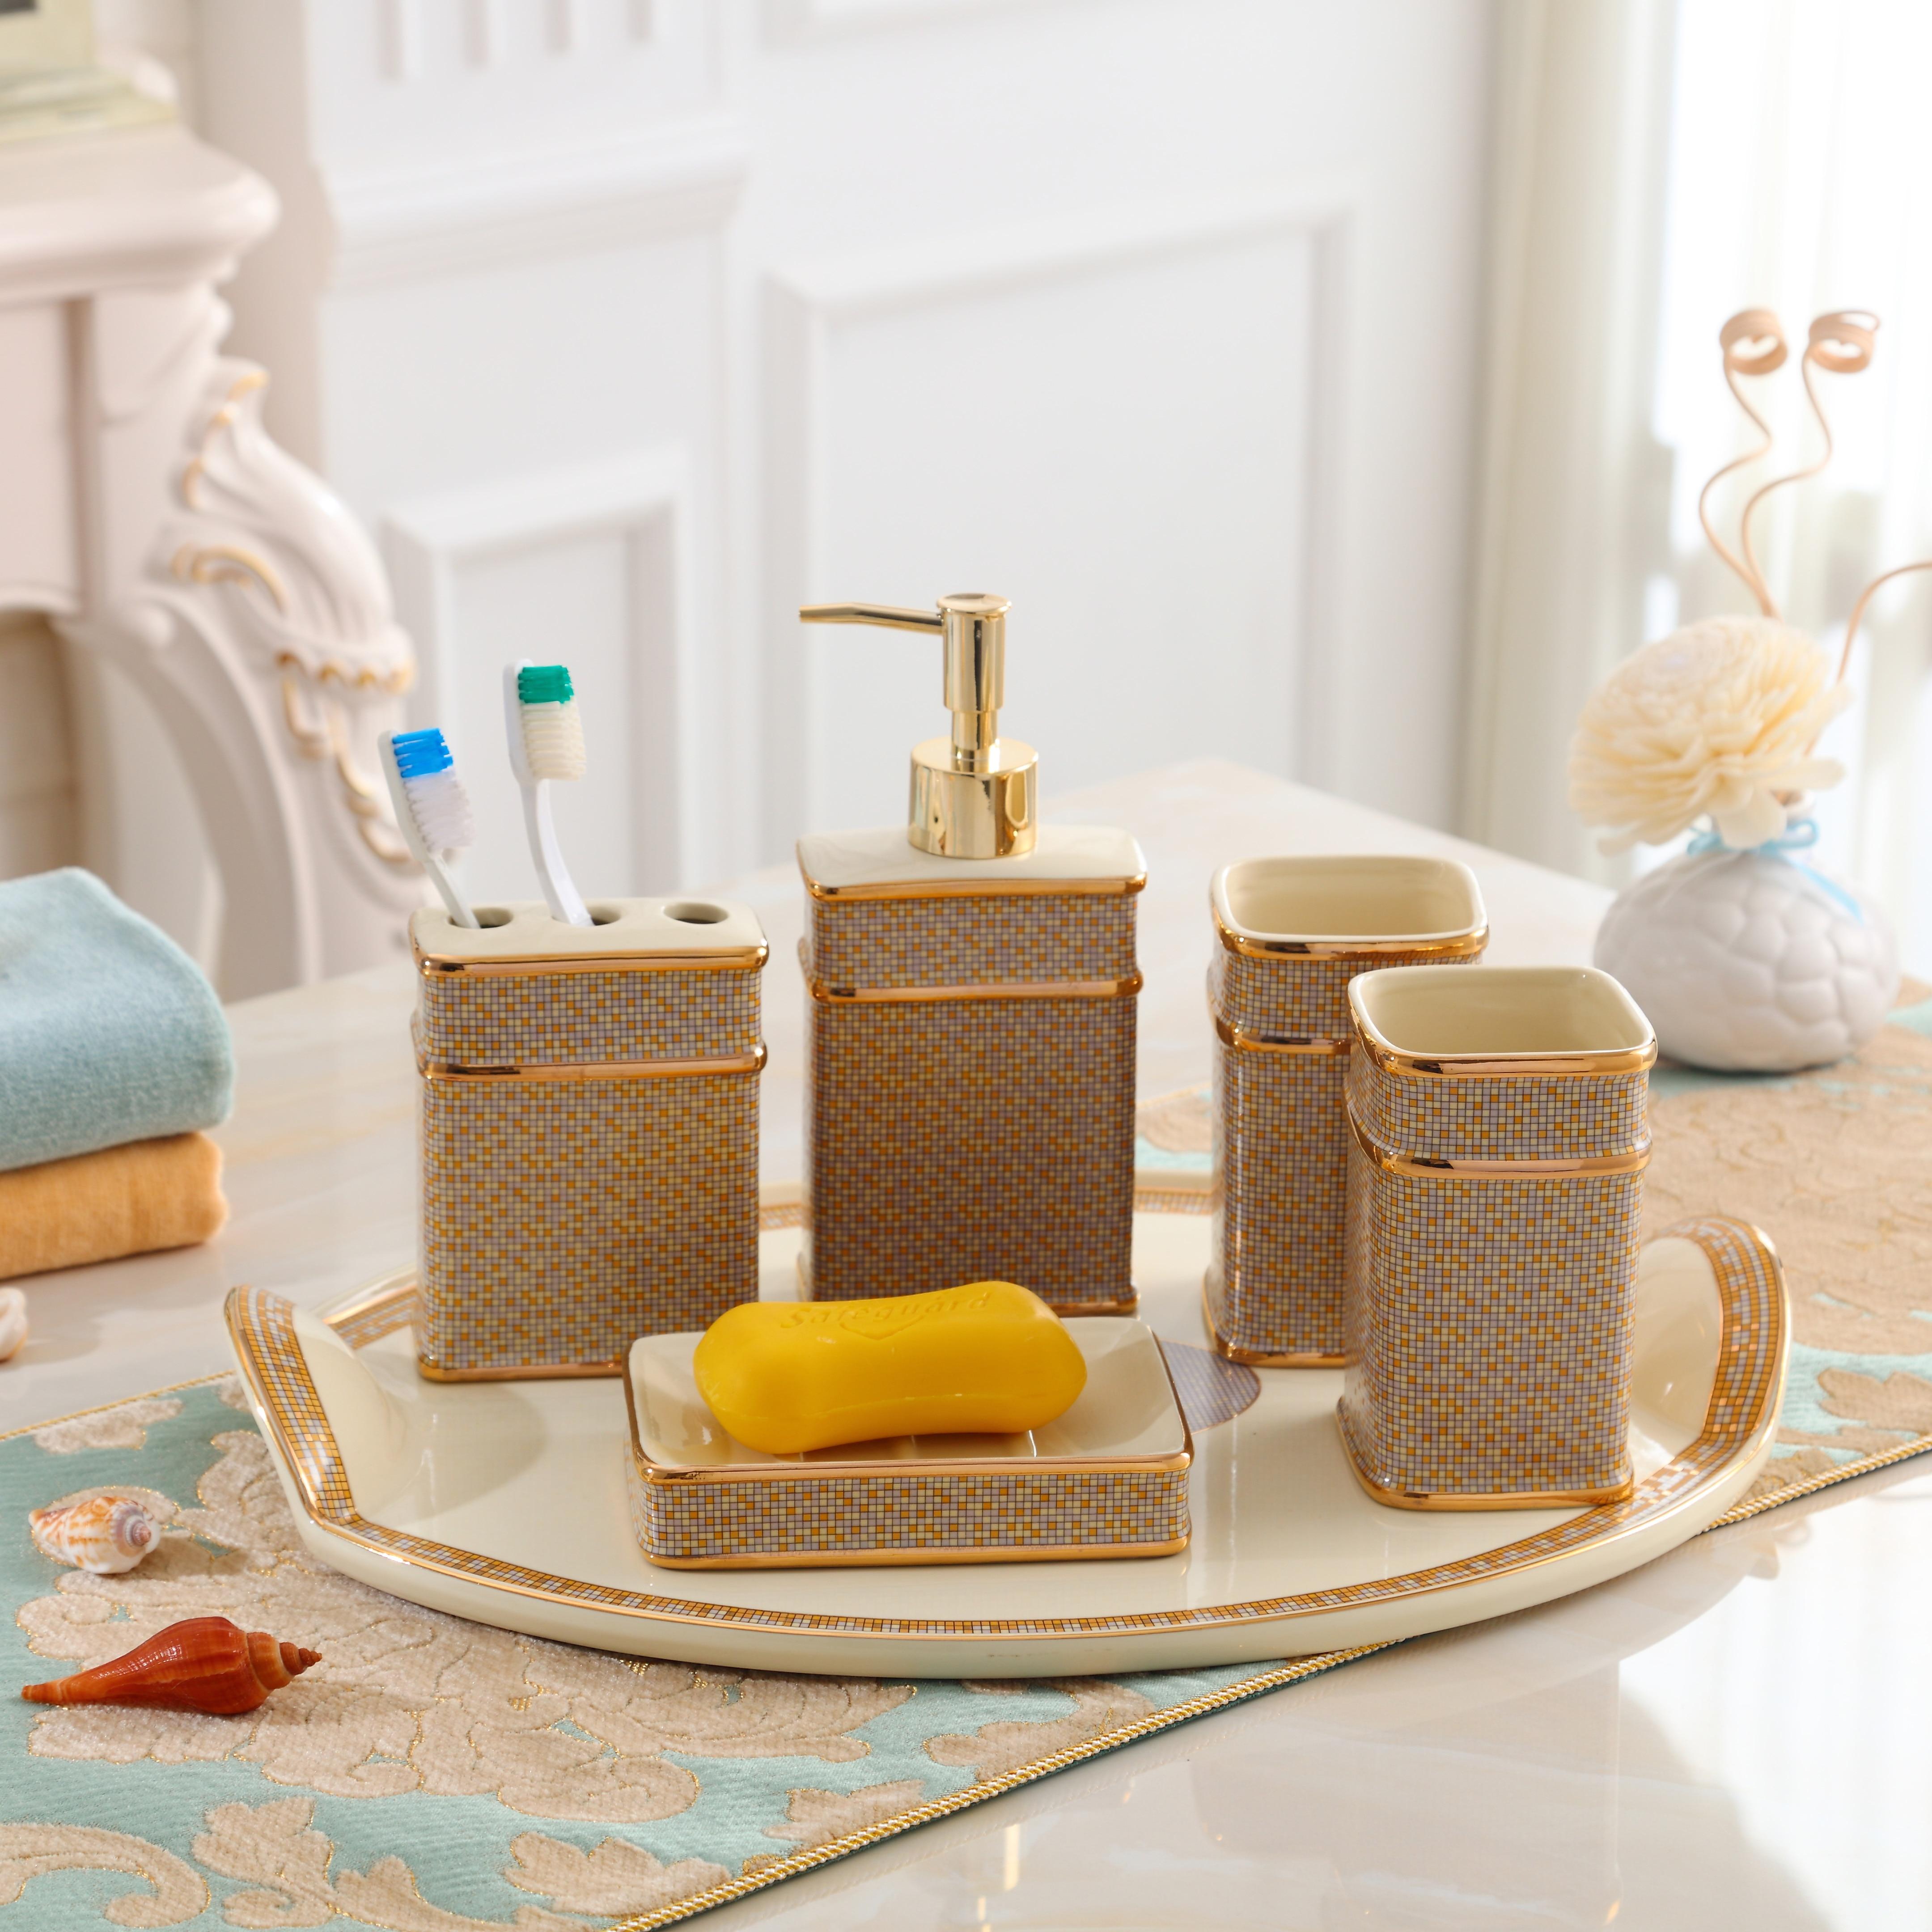 Bathroom Sets Ceramic Liquid Dispenser Toothbrush Holder Soap Dish Cups Accessories Toilet Supplies enlarge